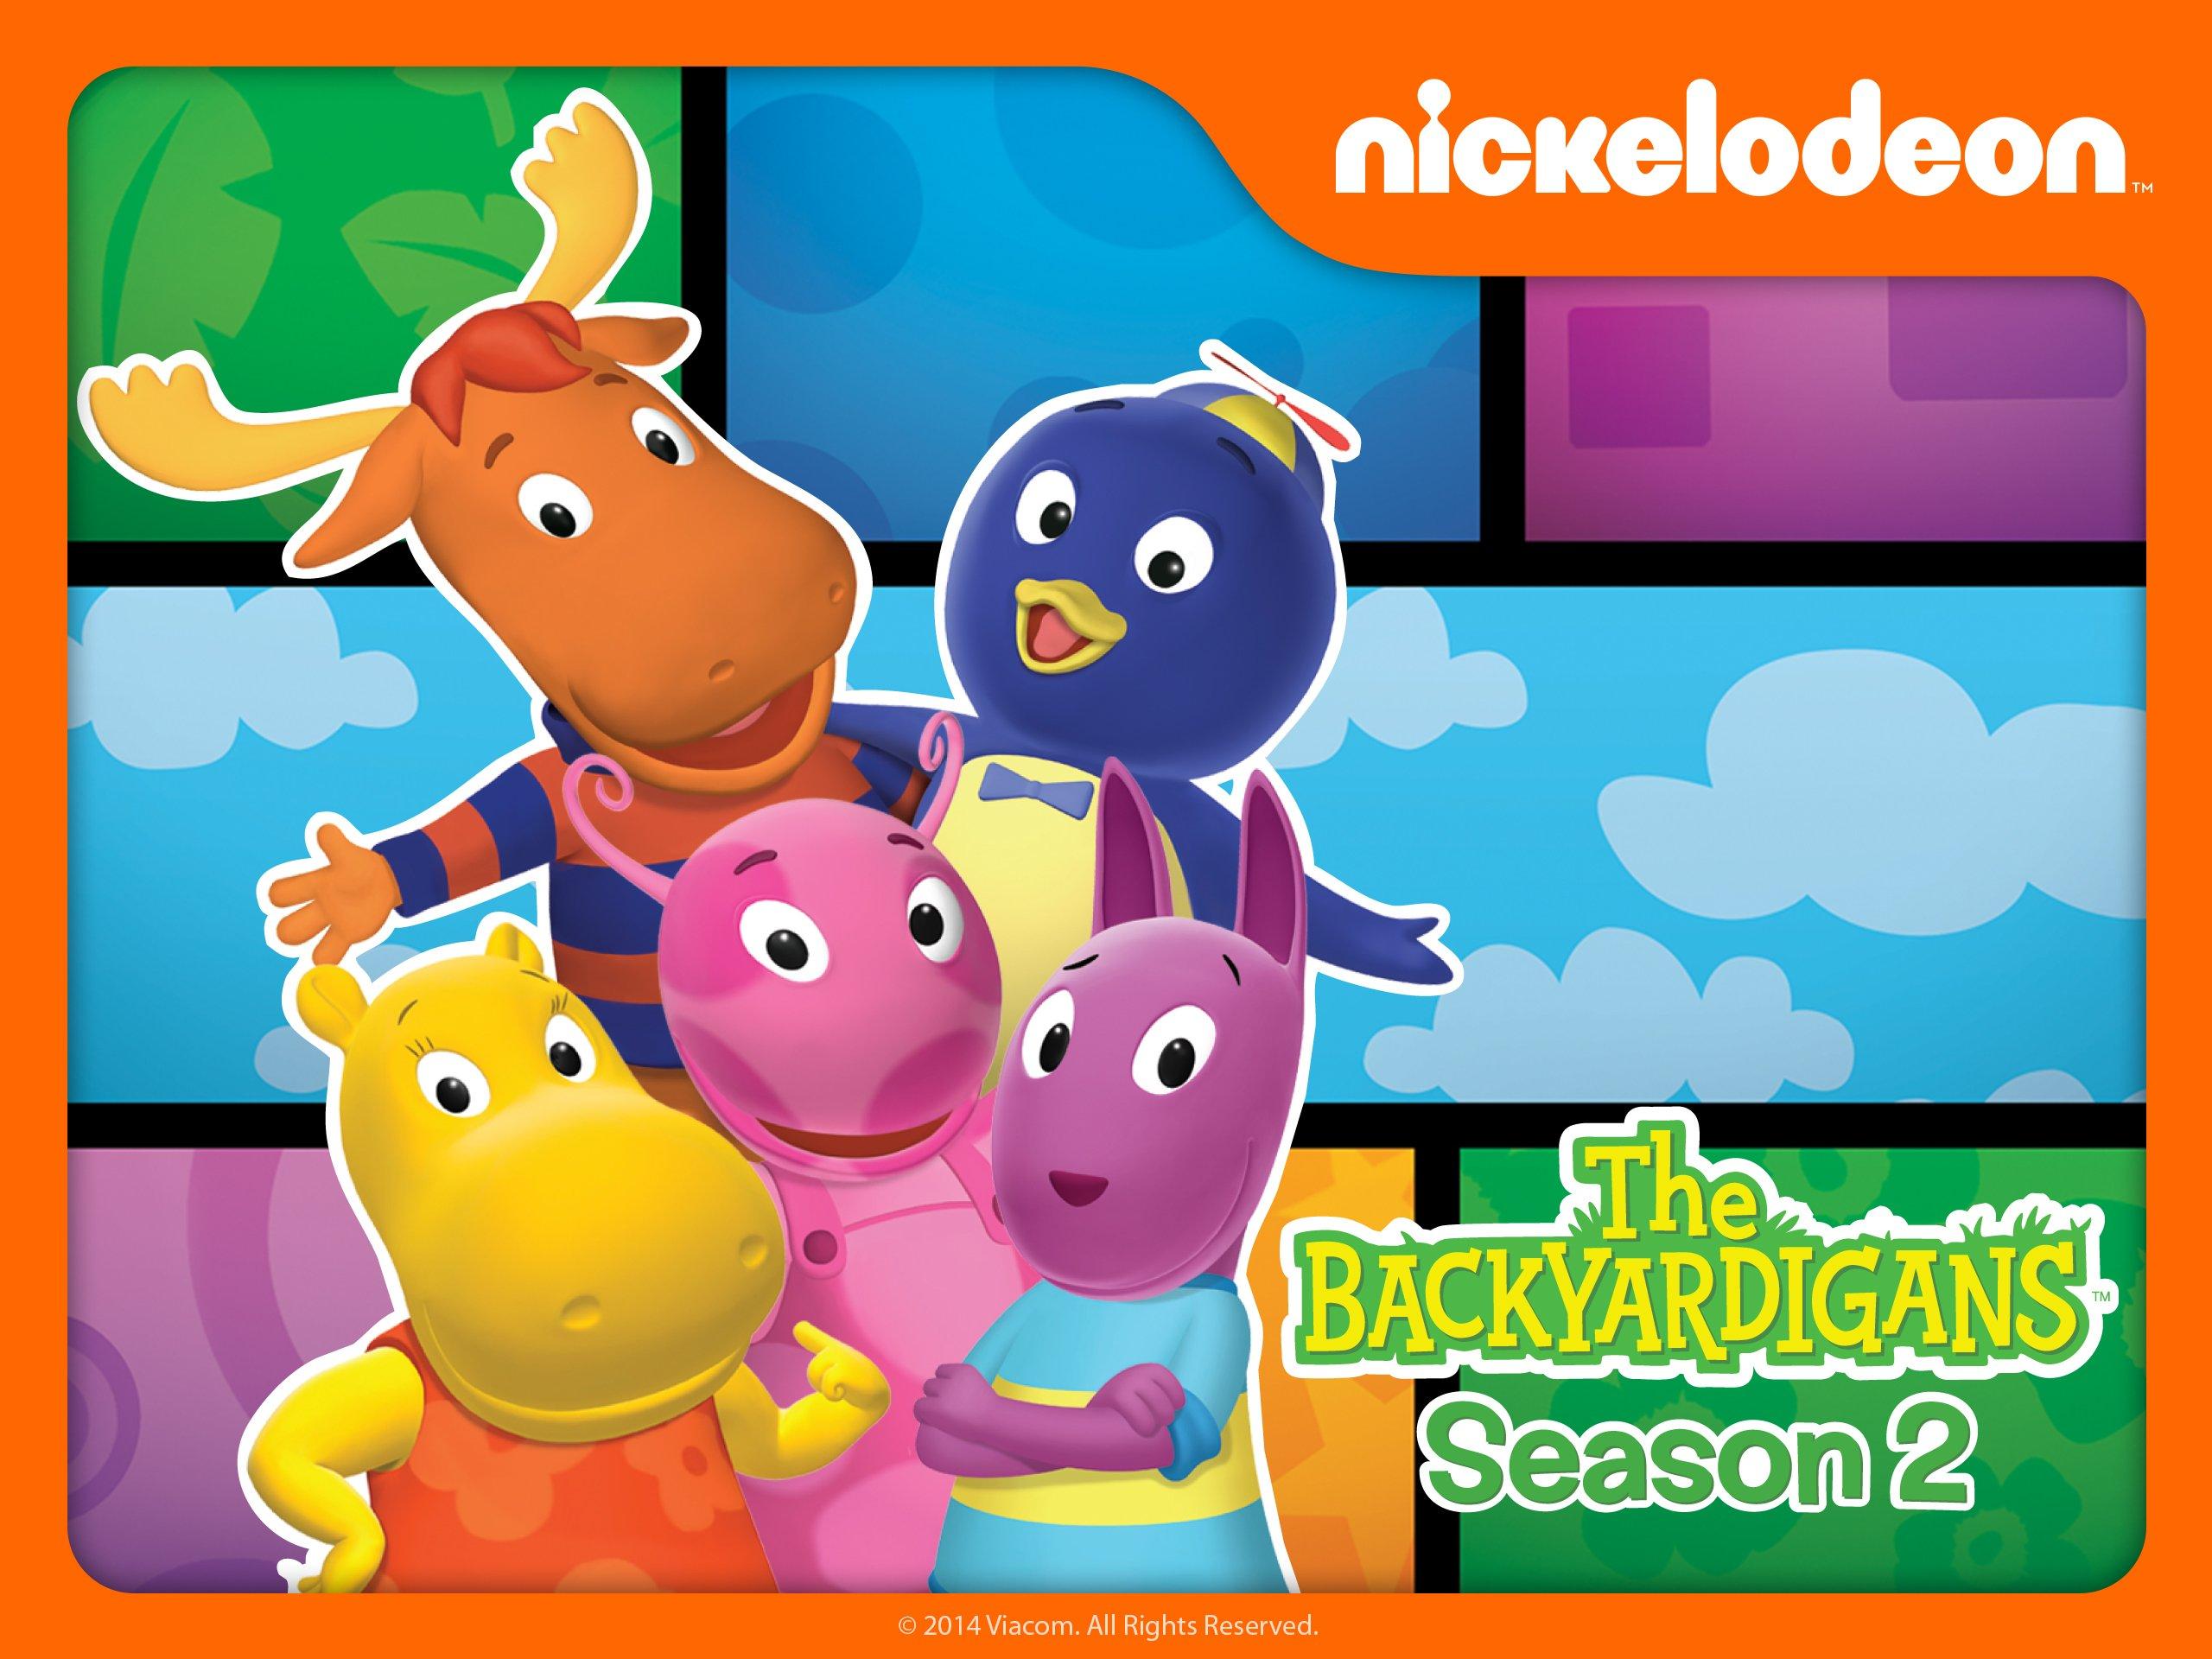 Amazon The Backyardigans Season 2 Digital Services LLC